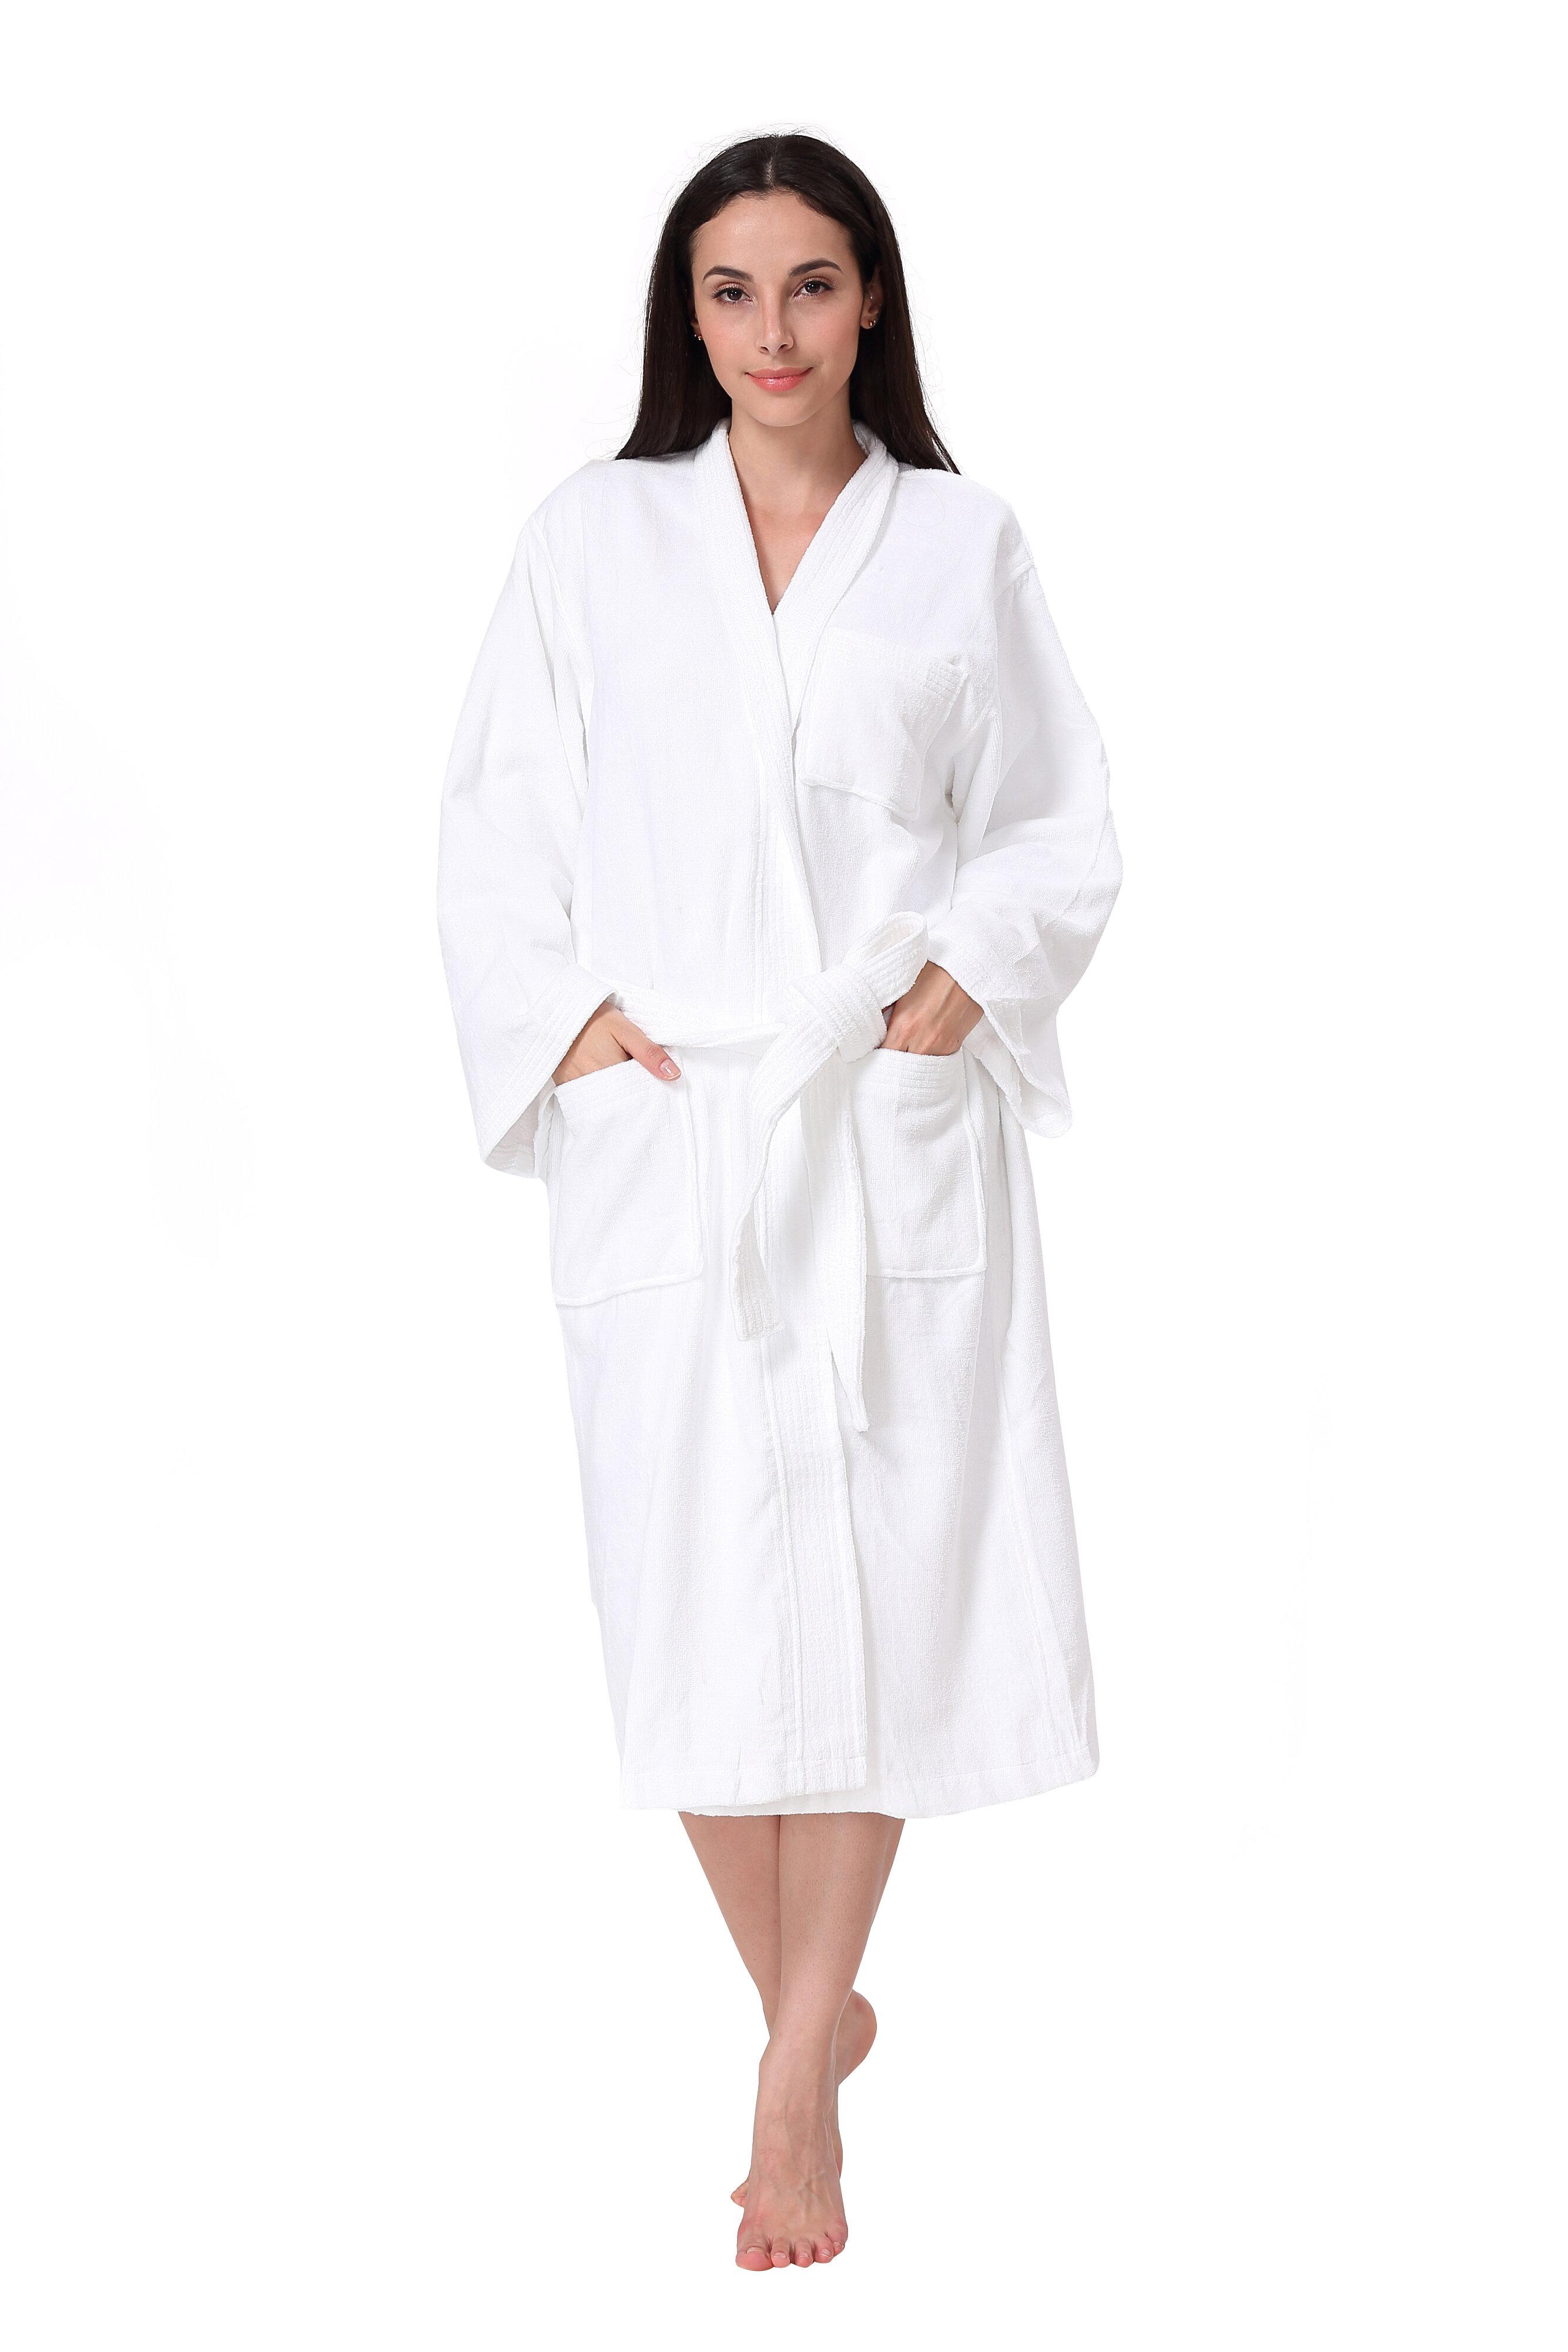 Charlton Home Othello Women S And Men S Spa Kimono 100 Cotton Terry Cloth Mid Calf Bathrobe Reviews Wayfair